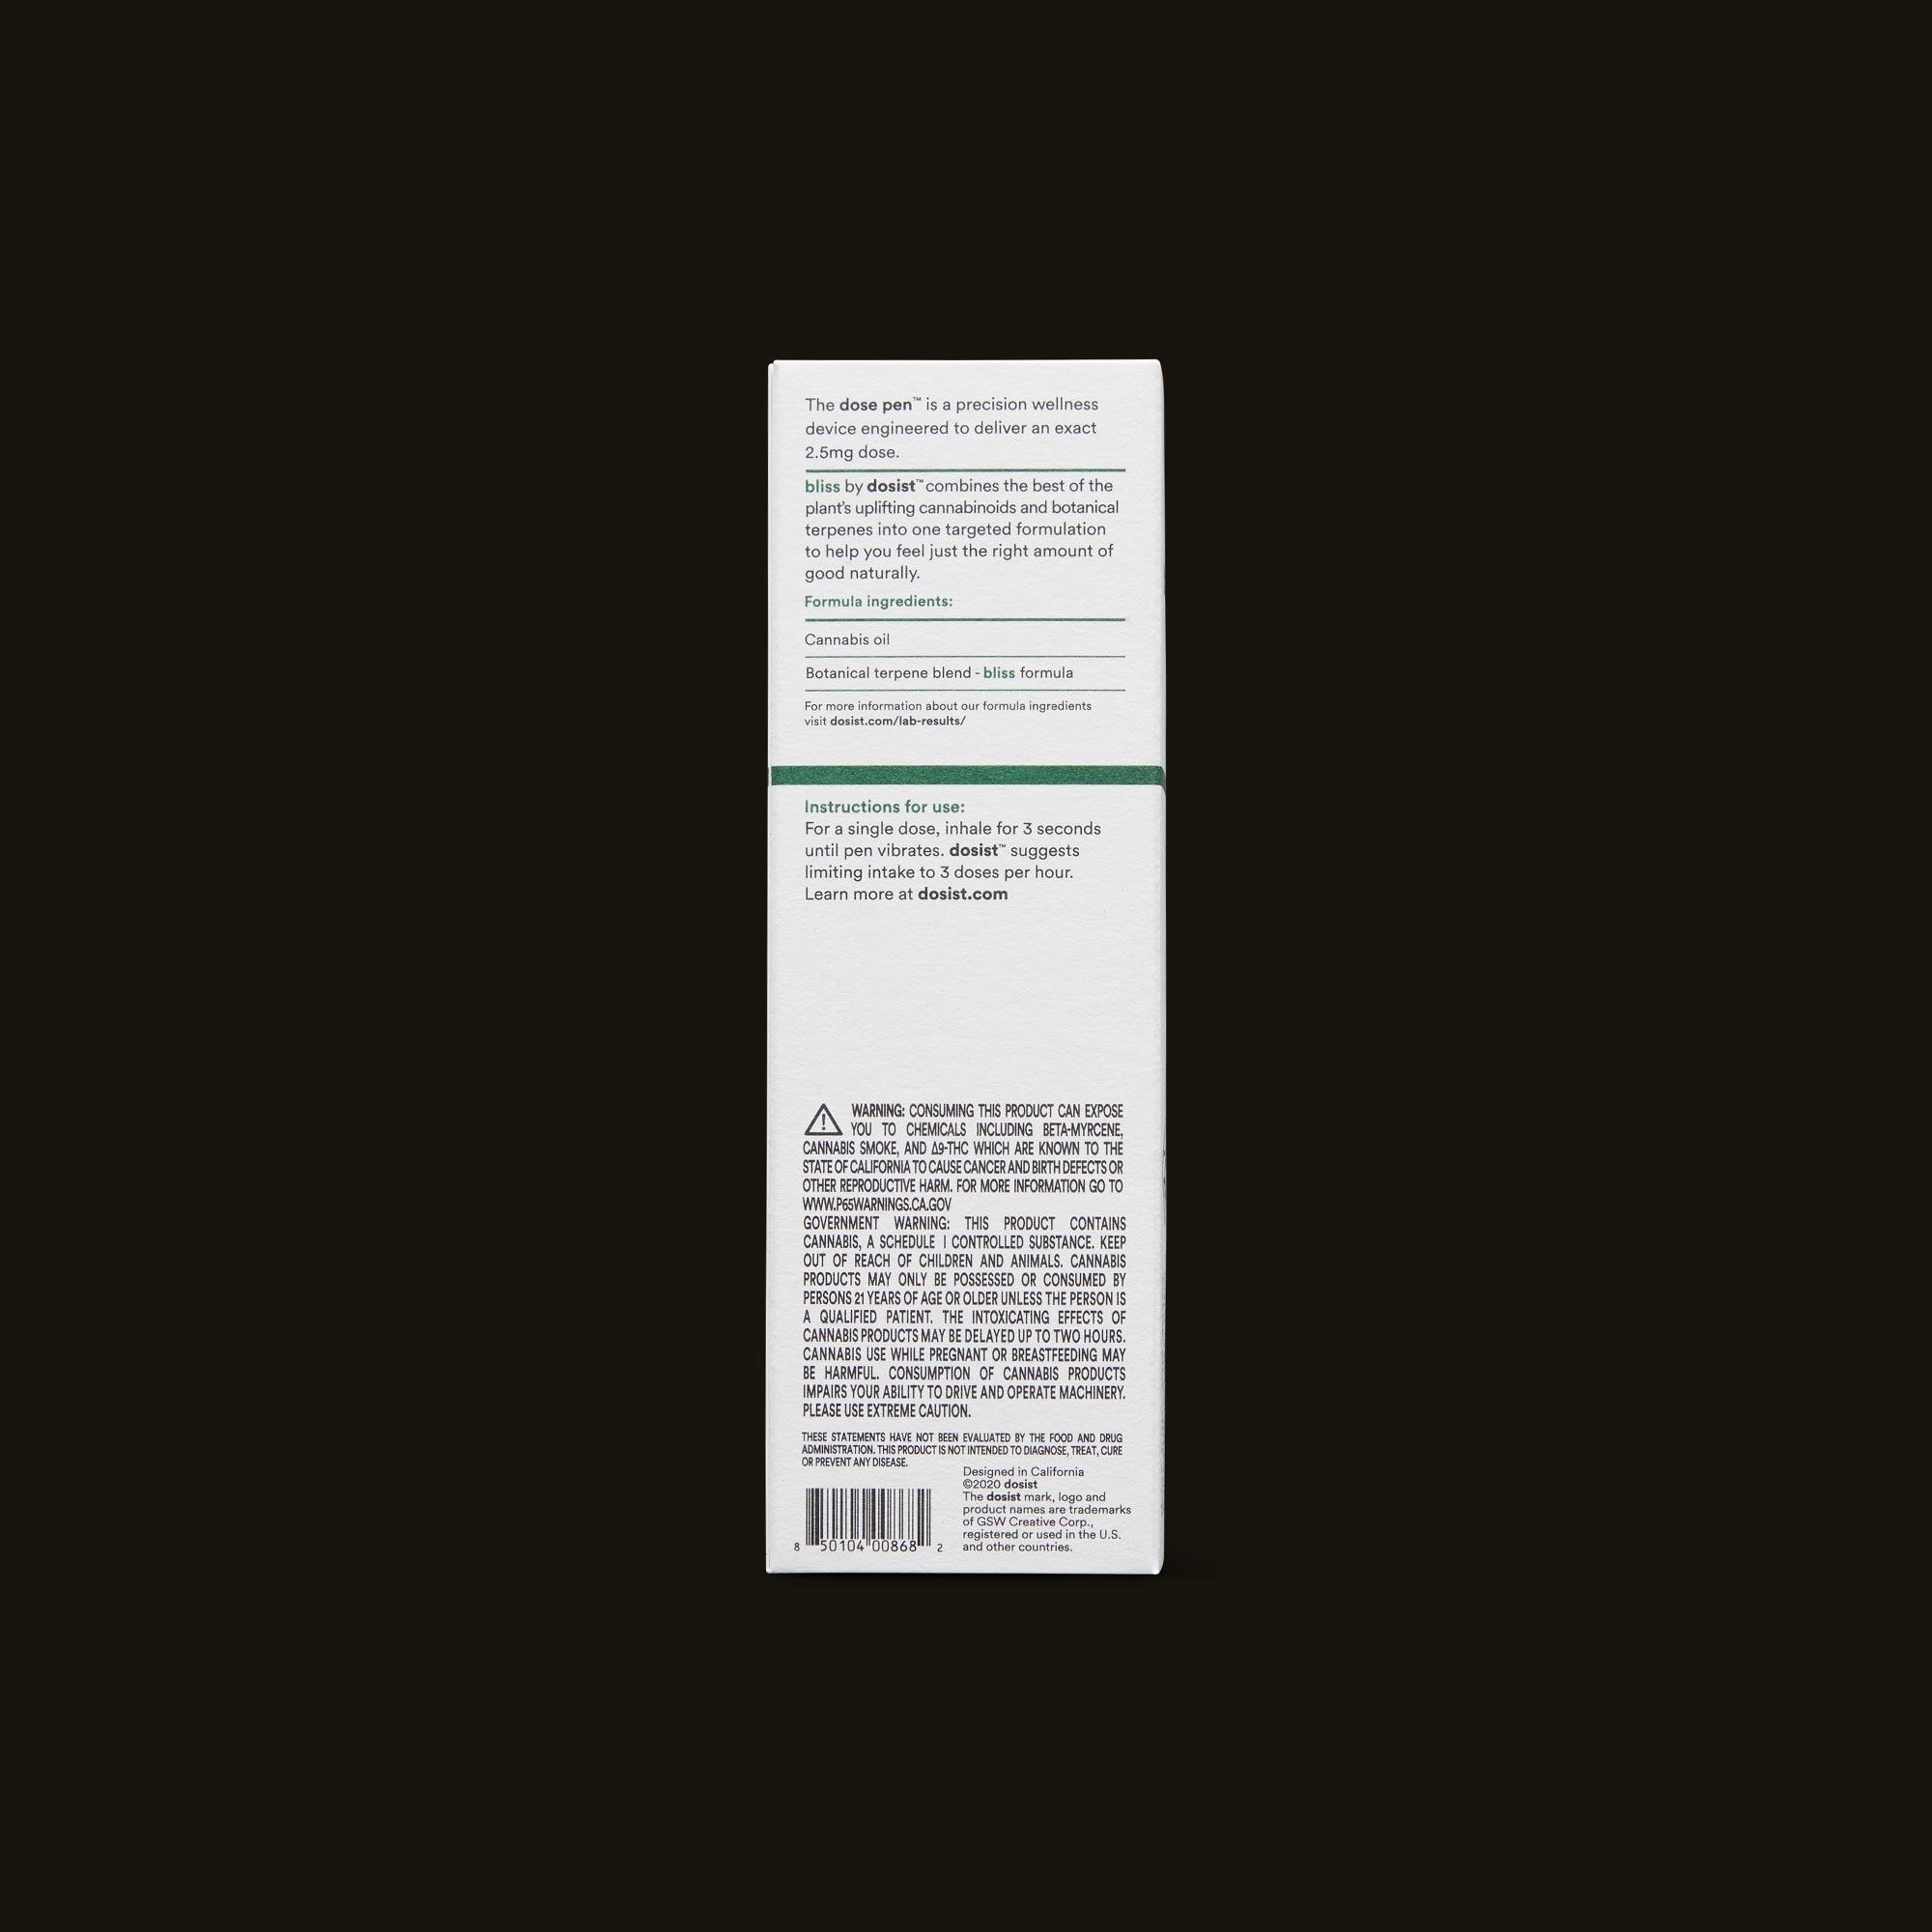 dosist bliss dose pen ingredients